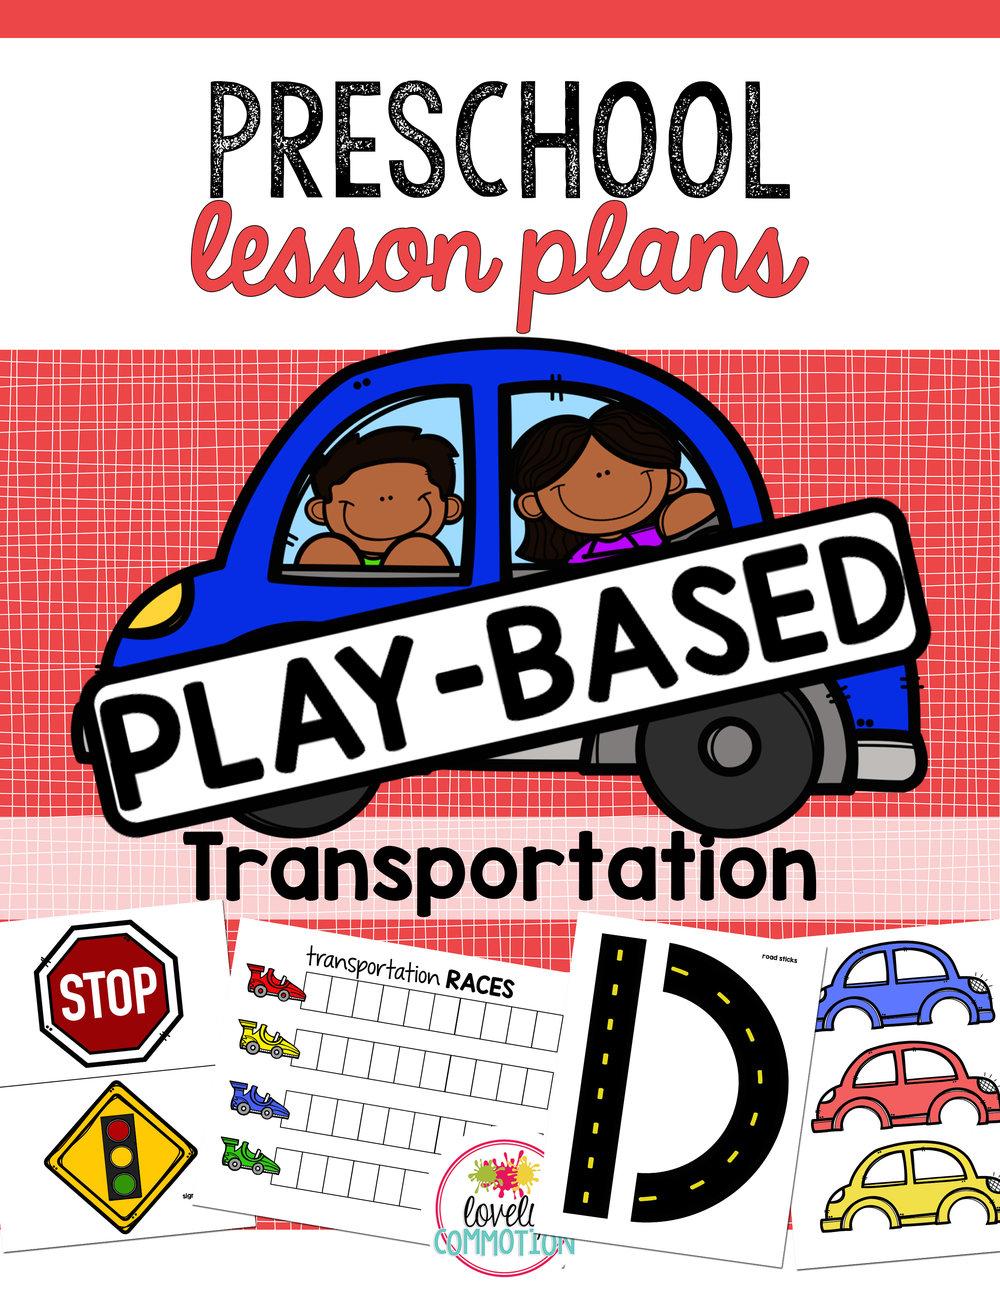 Preschool Play-Based Transportation Lesson Plans